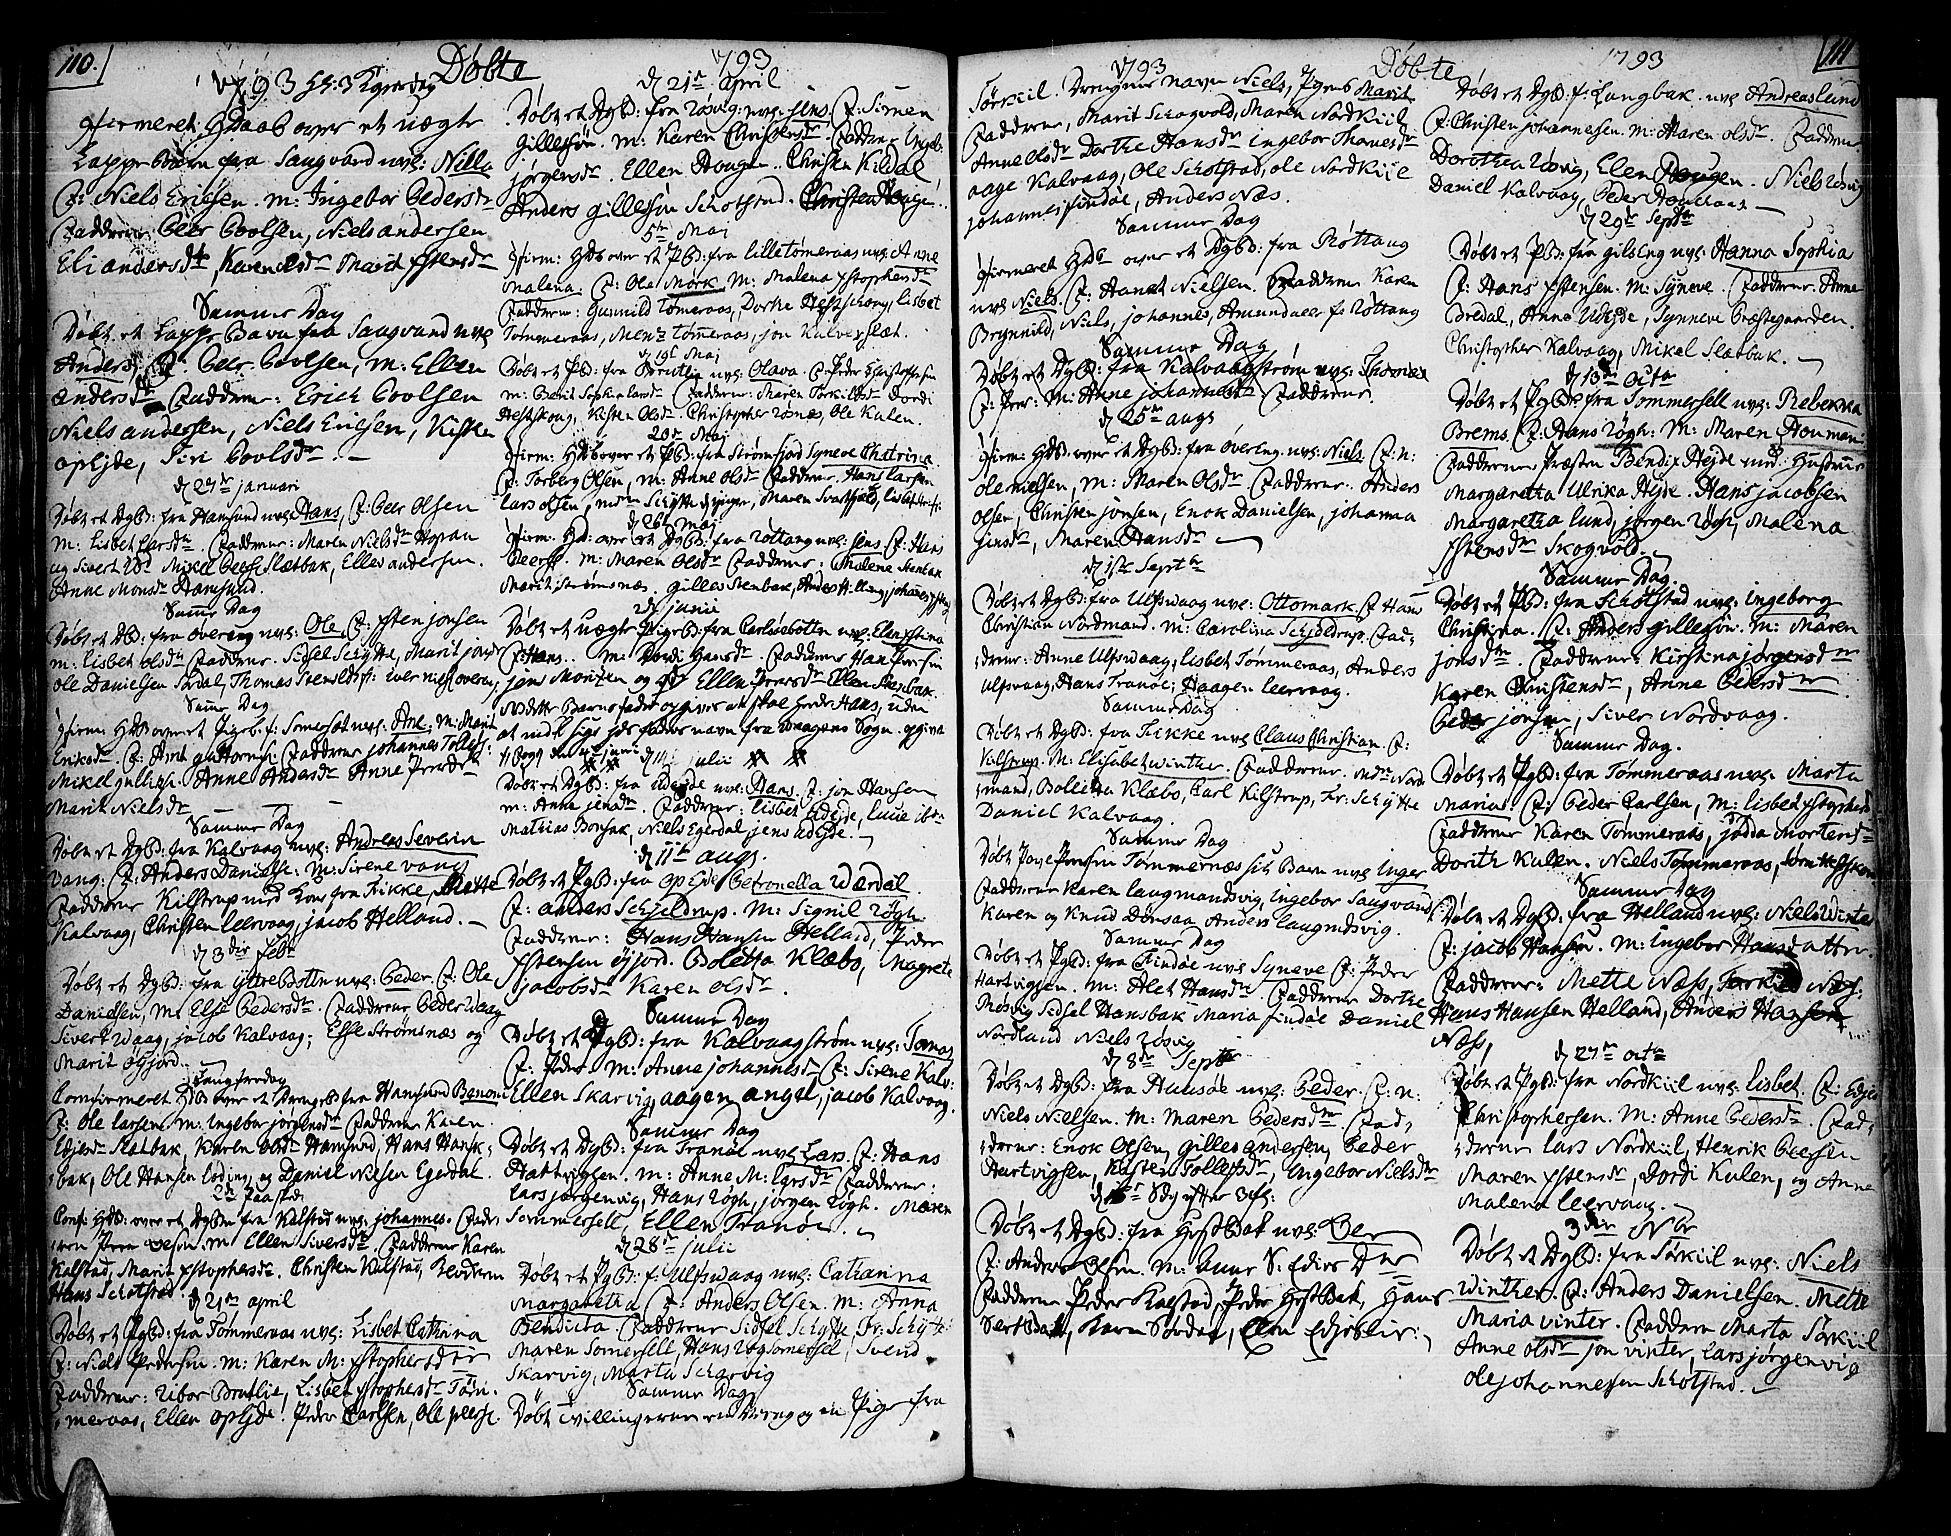 SAT, Ministerialprotokoller, klokkerbøker og fødselsregistre - Nordland, 859/L0841: Ministerialbok nr. 859A01, 1766-1821, s. 110-111